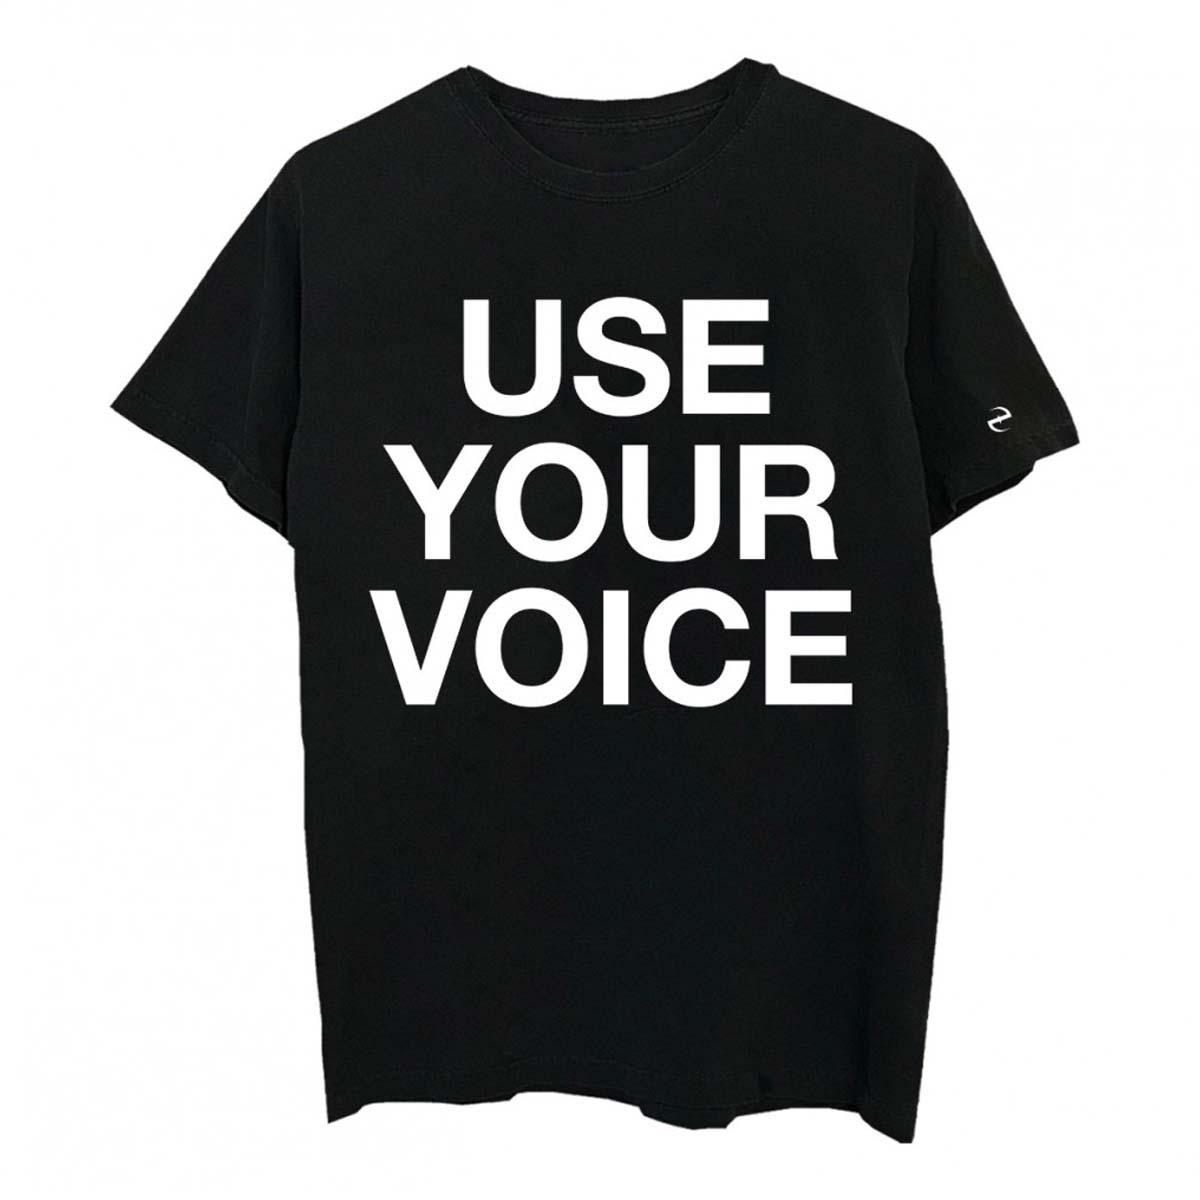 Use Your Voice Black T-shirt